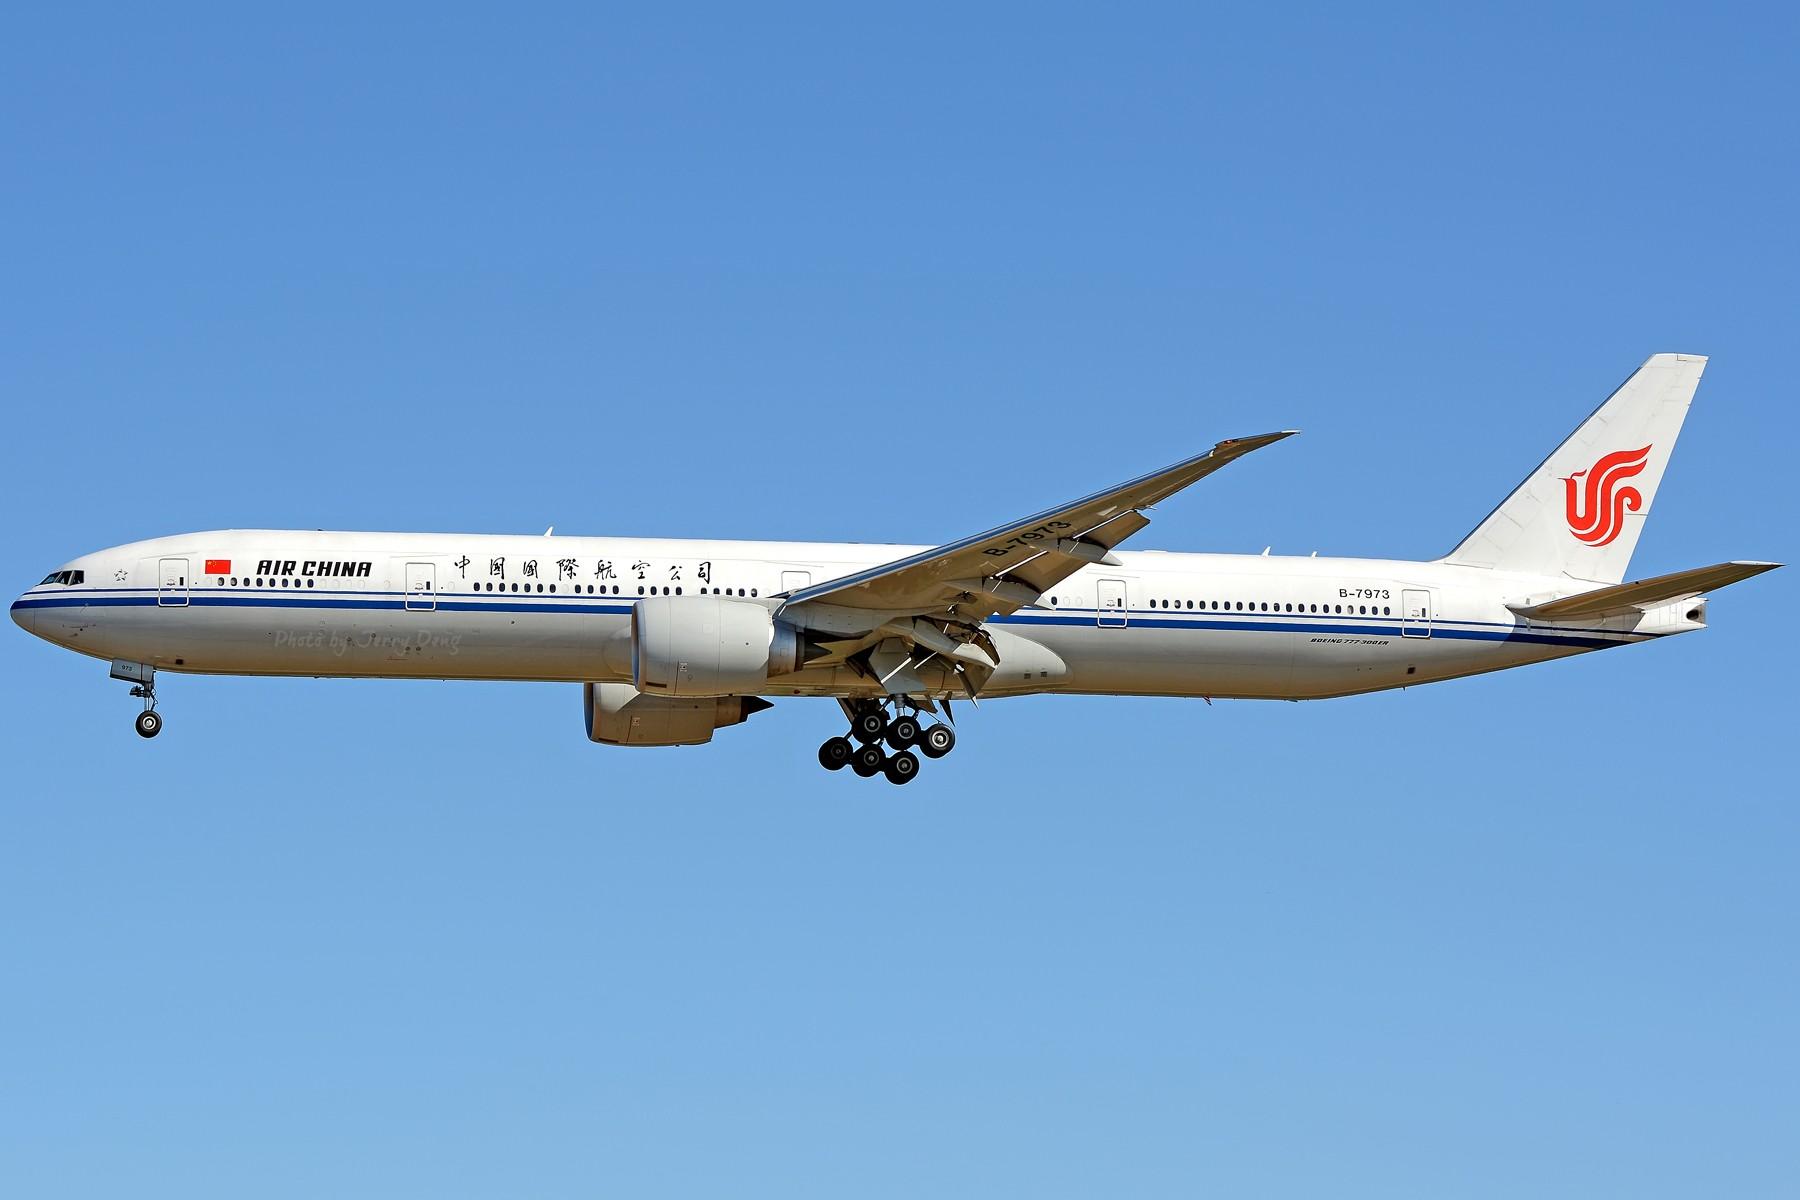 Re:[原创]【多图党】PEK落地一组国航系【2】 BOEING 777-300ER B-7973 中国北京首都国际机场